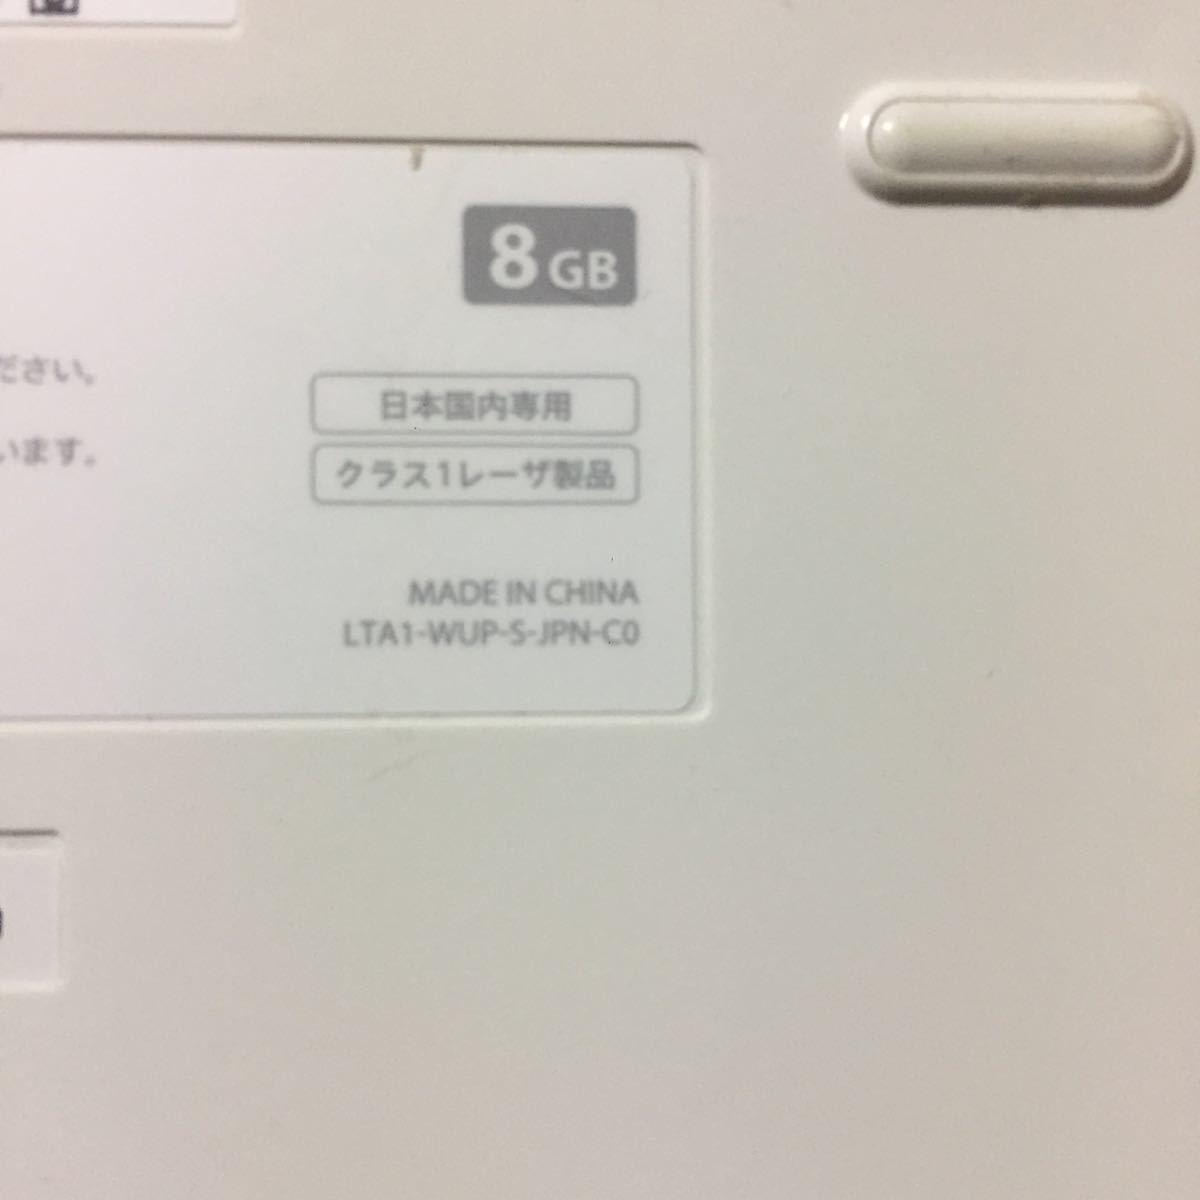 Wii U 本体セット 動作品 8GB ベーシックNintendo 任天堂 シロ _画像5